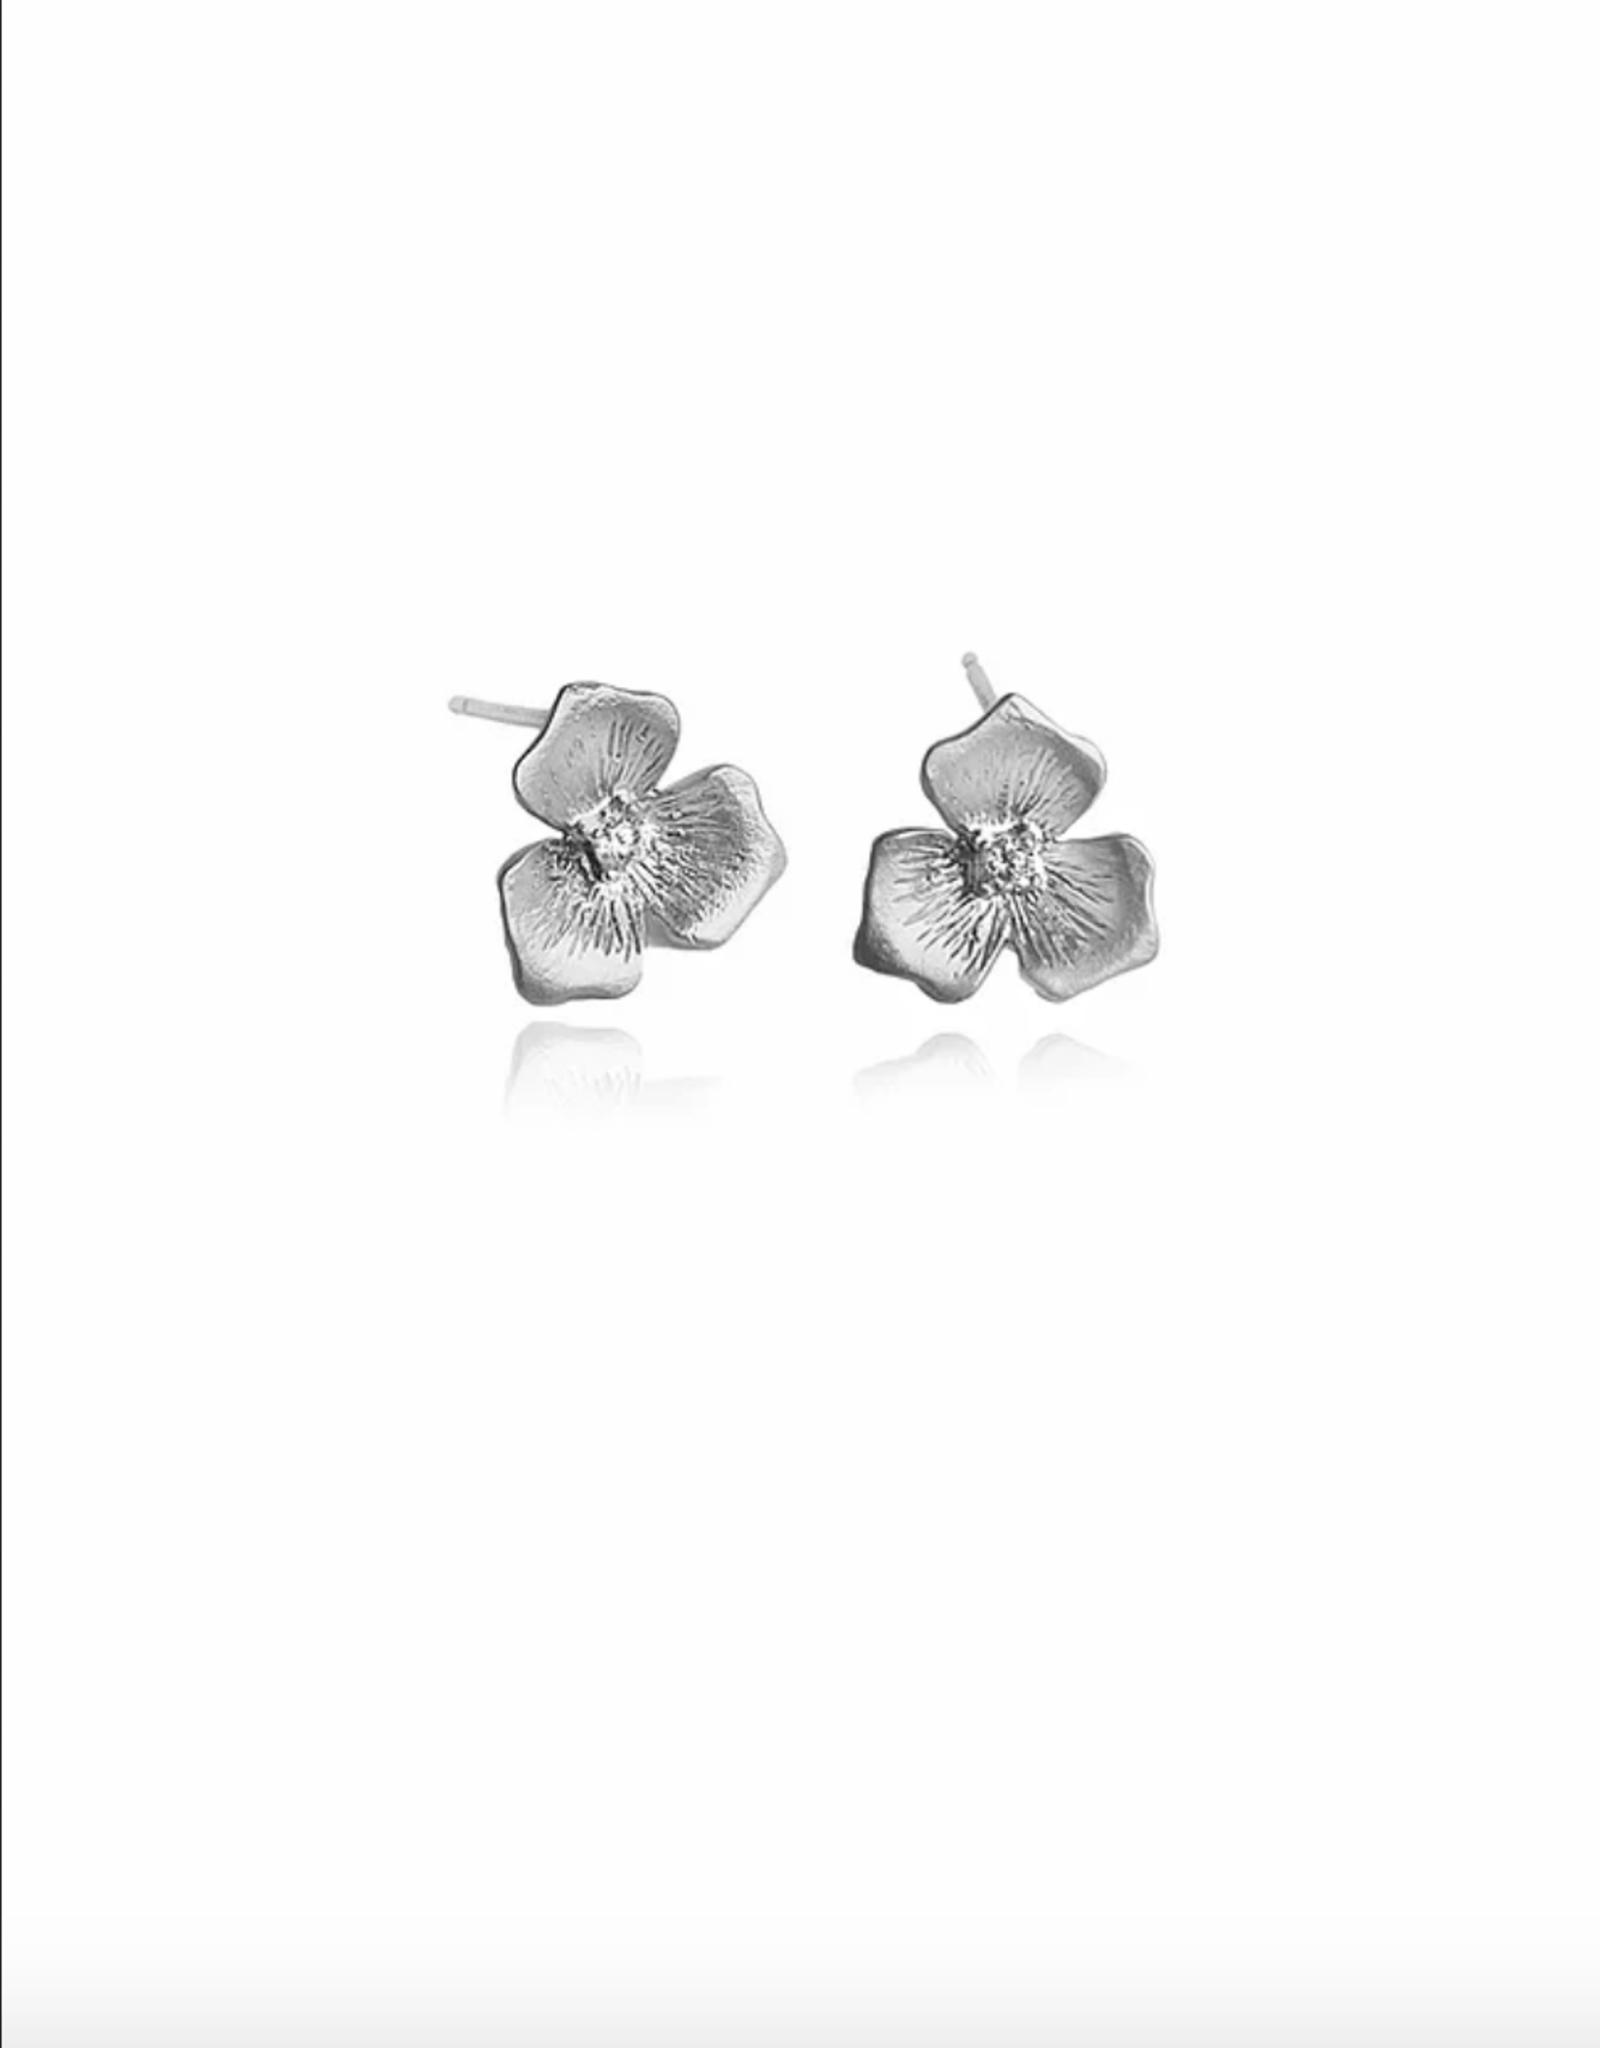 Lakoo Designs Silver Sm Flower CZ